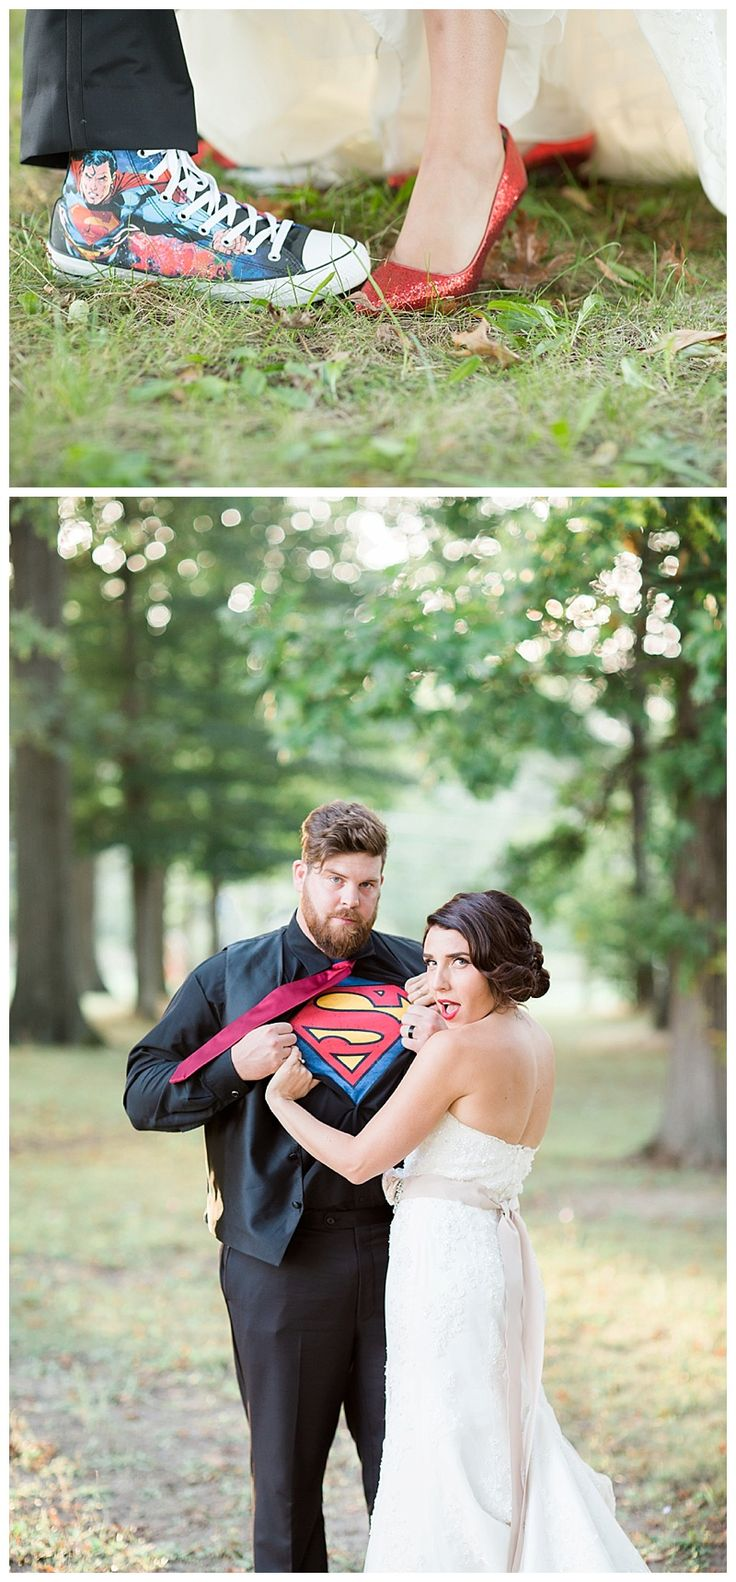 Superman wedding portrait